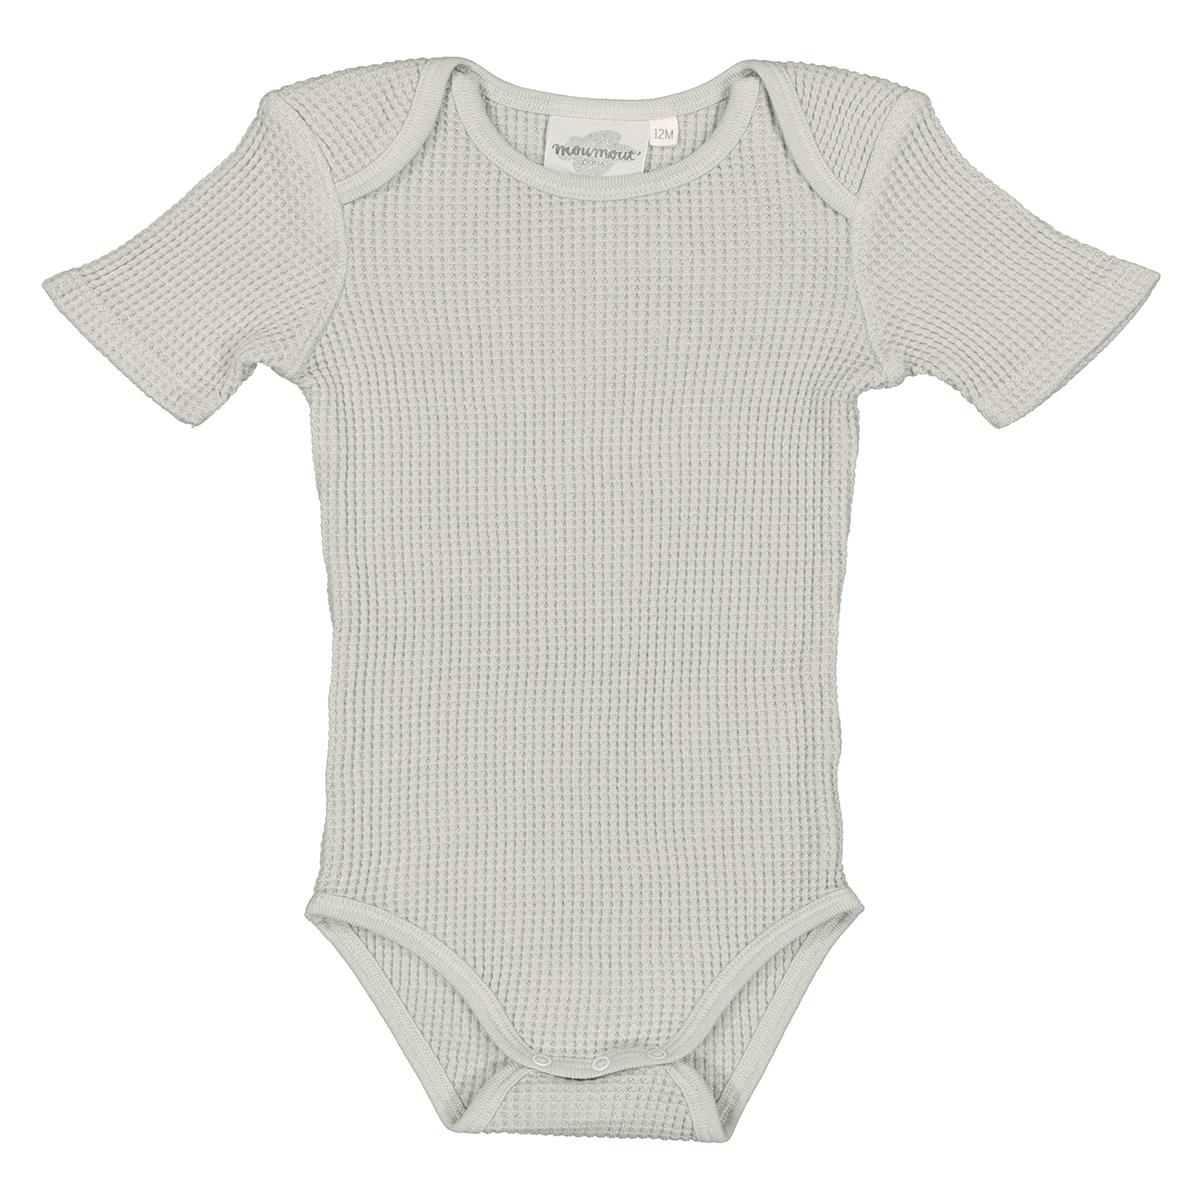 Body & Pyjama Body Raymond Bee Amande - 12 Mois Body Raymond Bee Amande - 12 Mois